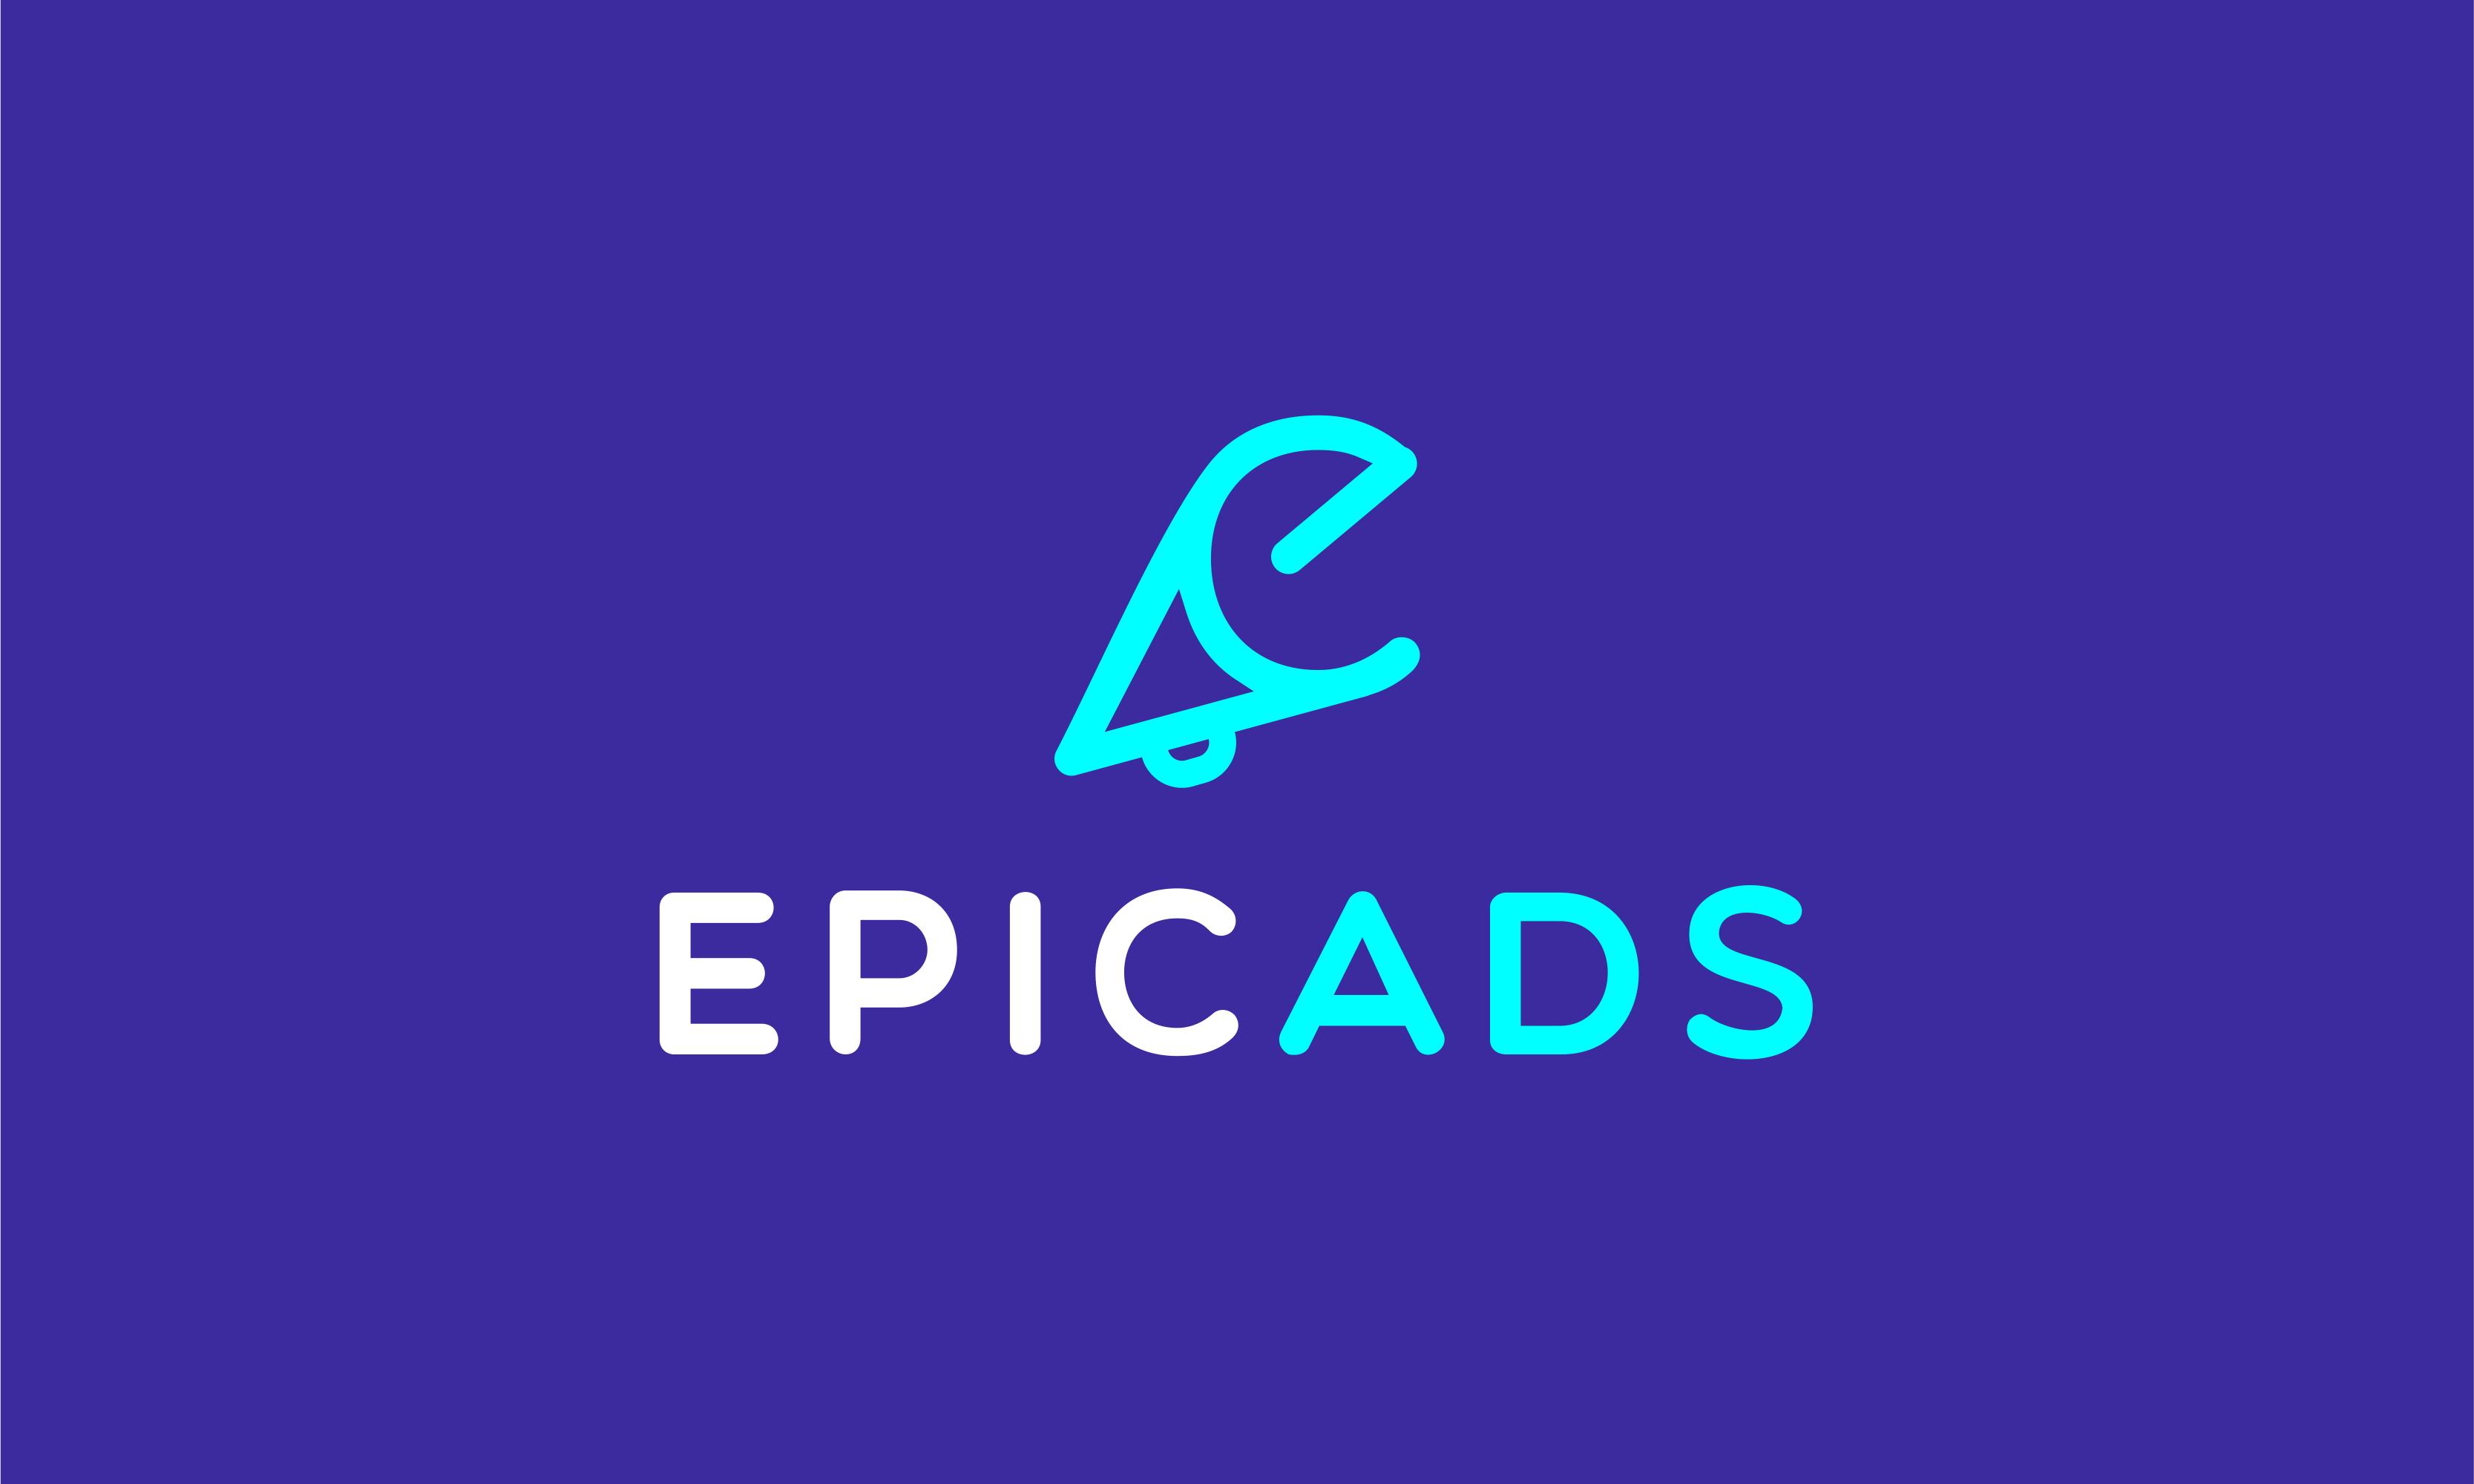 Epicads